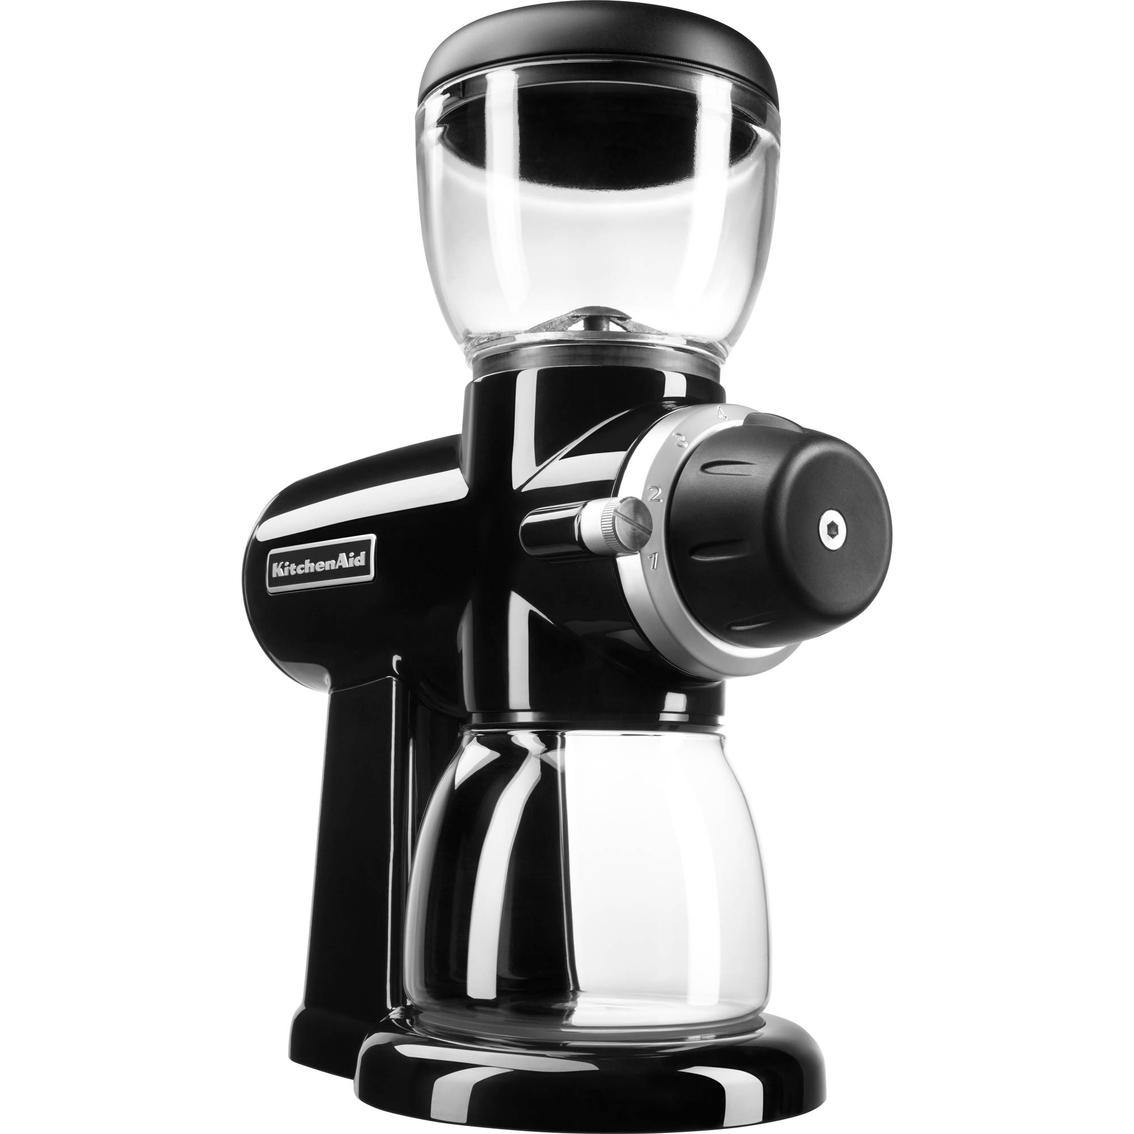 Kitchenaid Kcg0702ob Burr Grinder  Coffee Grinders Home